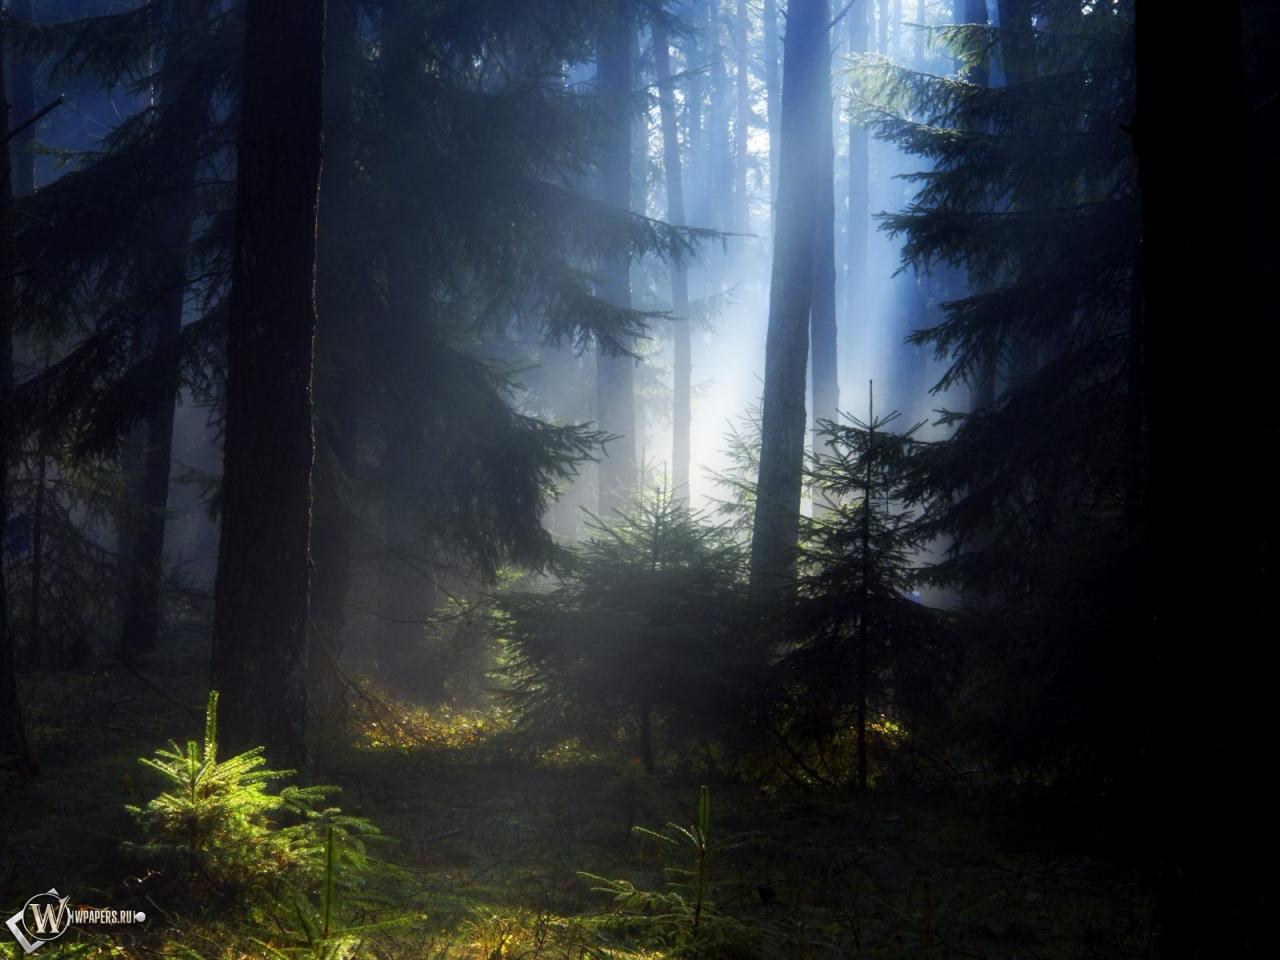 Еловый лес 1280x960